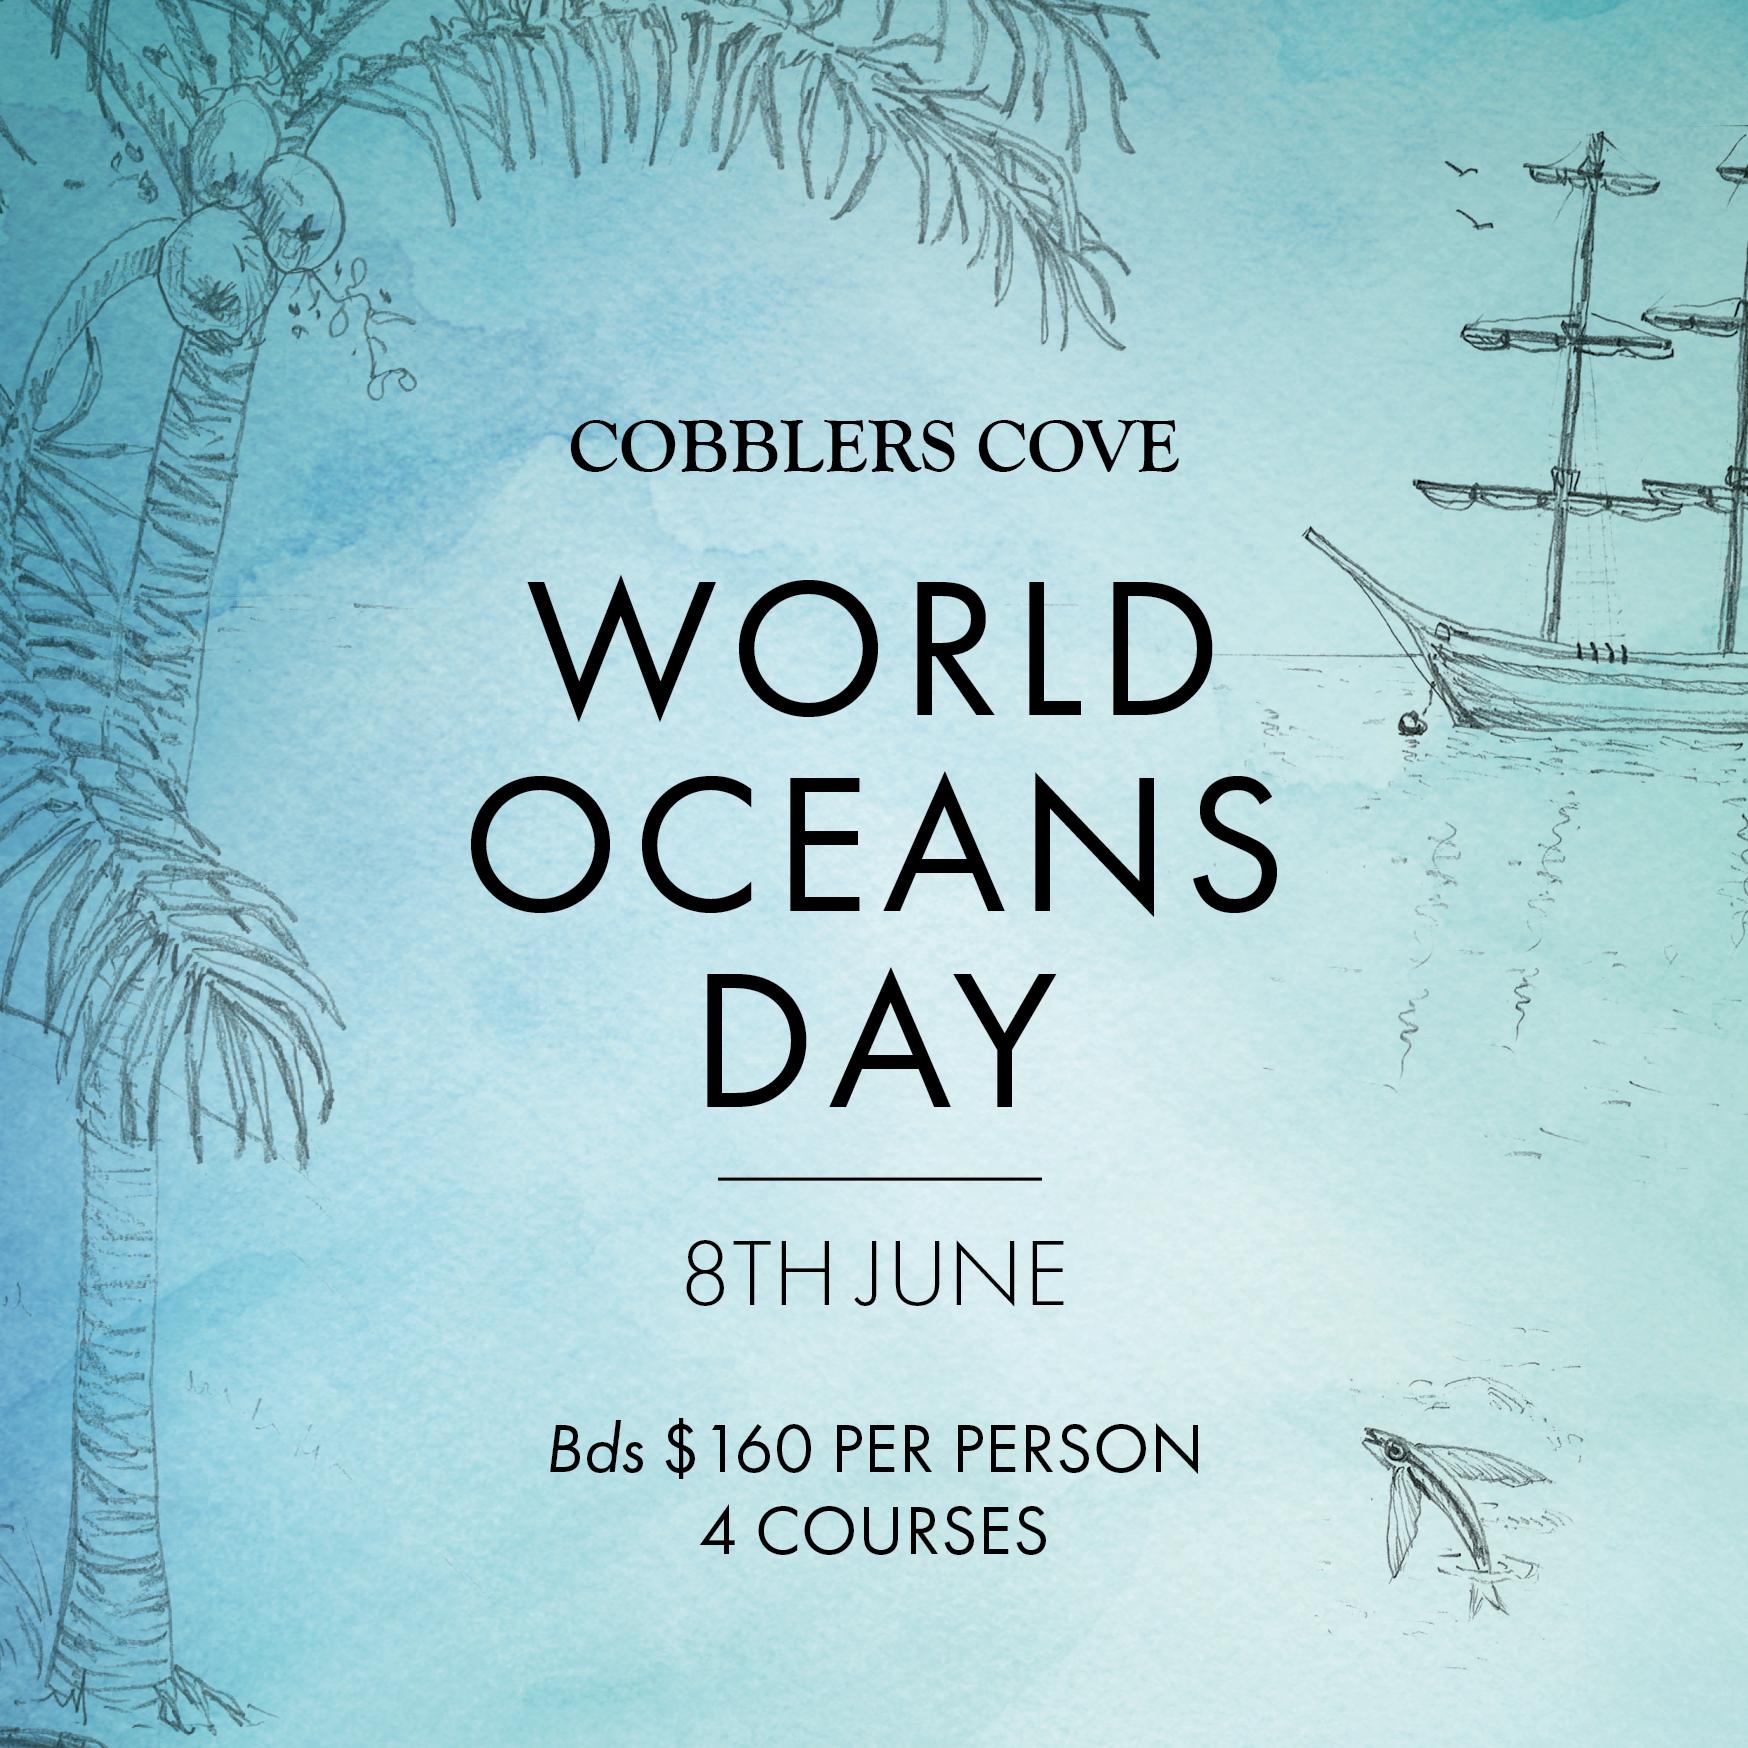 CC_World Oceans Day Square AW.jpg